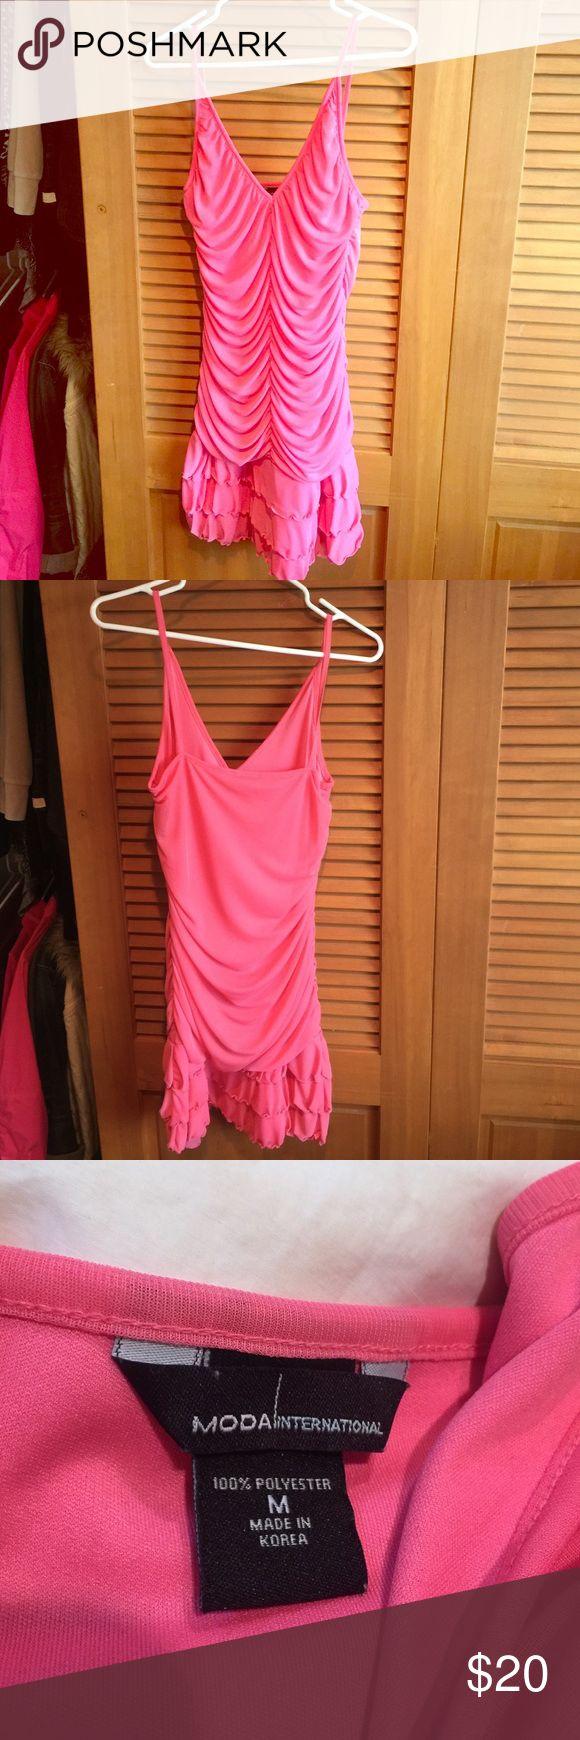 Cute pink mini dress So cute! Ruffles at the bottom, hits mid thigh, low cut. Great condition! Beautiful pink color. Moda International Dresses Mini